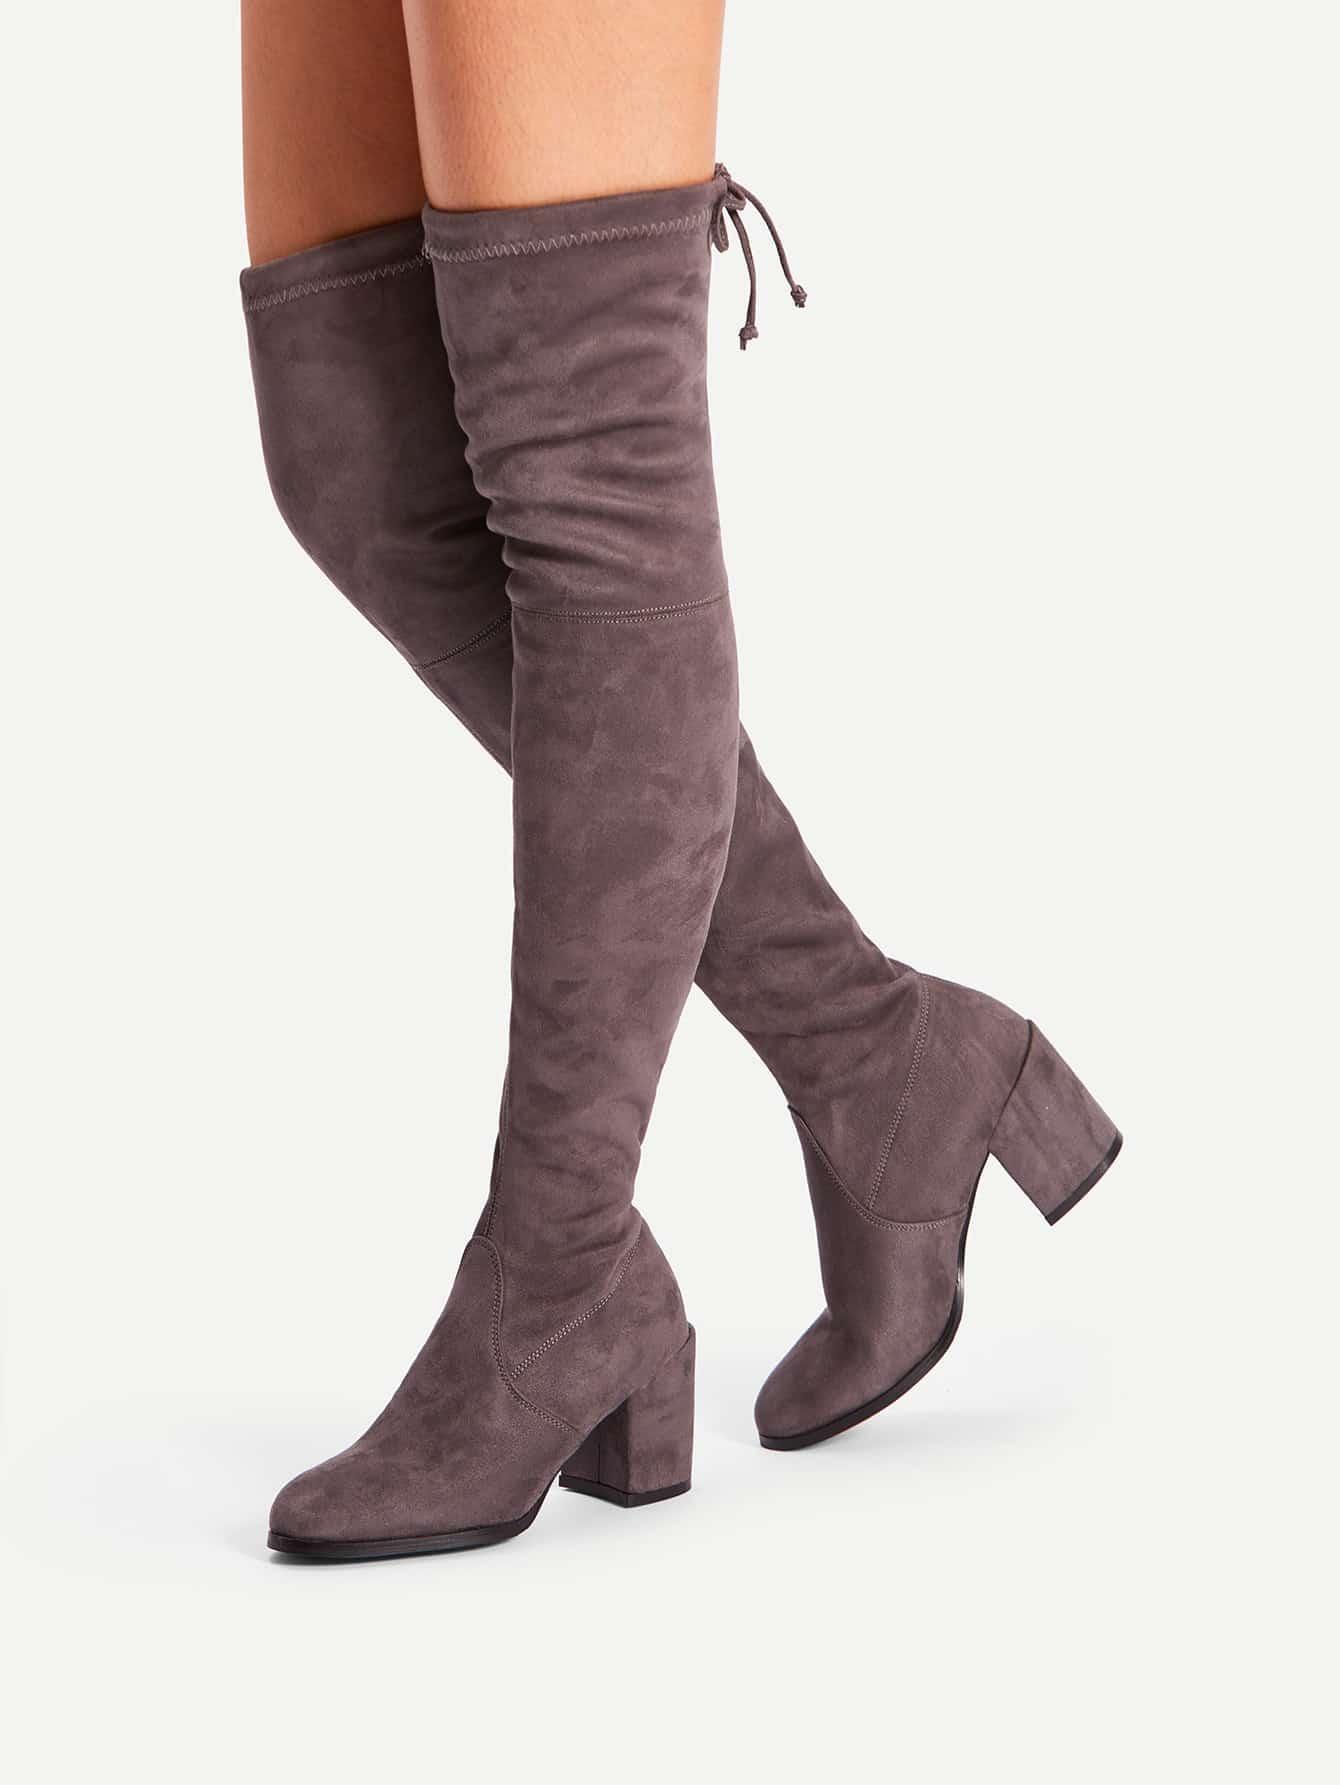 Tie Back Over Knee Block Heeled Boots peter block stewardship choosing service over self interest